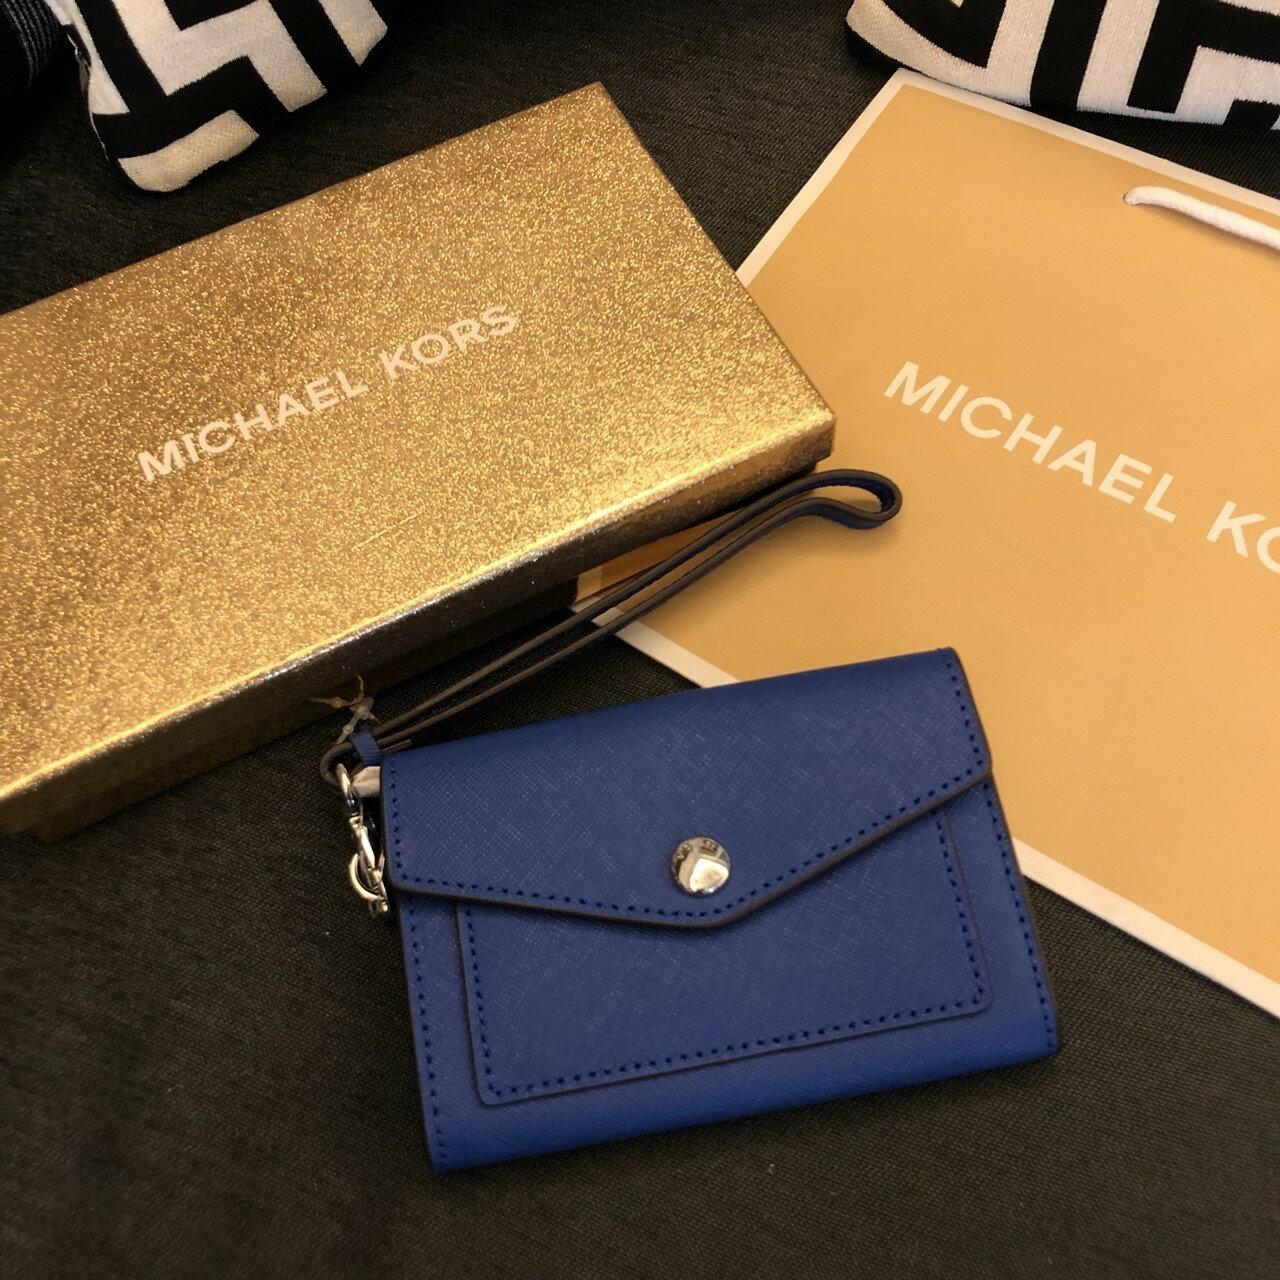 MK 信封手拿皮夾 寶藍色 中長夾 零錢包 卡夾 短夾 名牌皮夾 MICHAEL KOR 現貨 美國直購